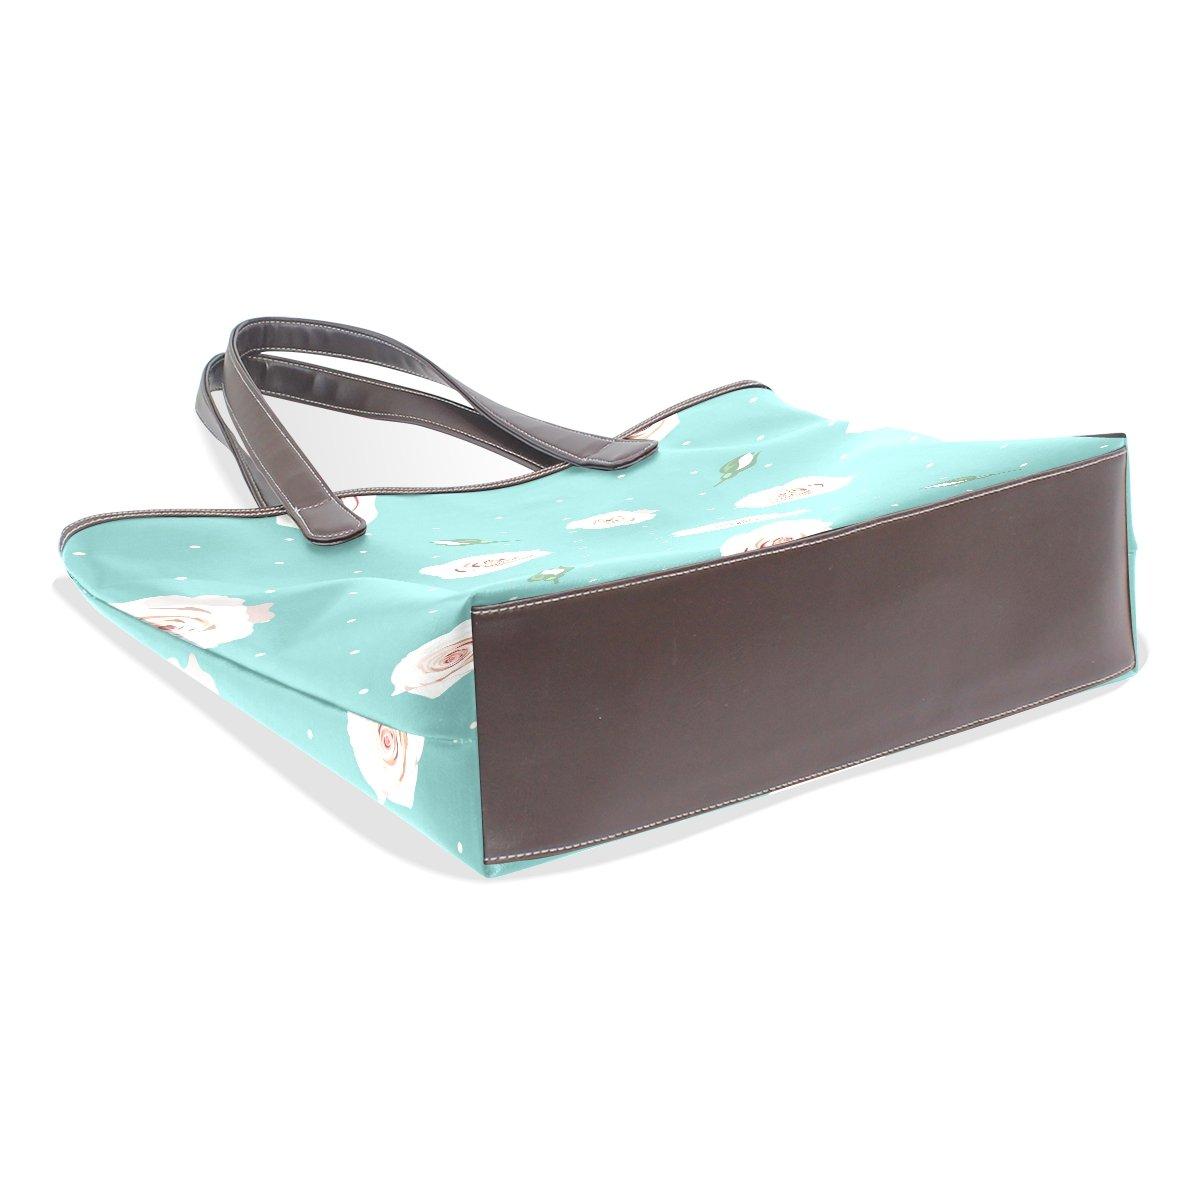 Ye Store White Rose Lady PU Leather Handbag Tote Bag Shoulder Bag Shopping Bag